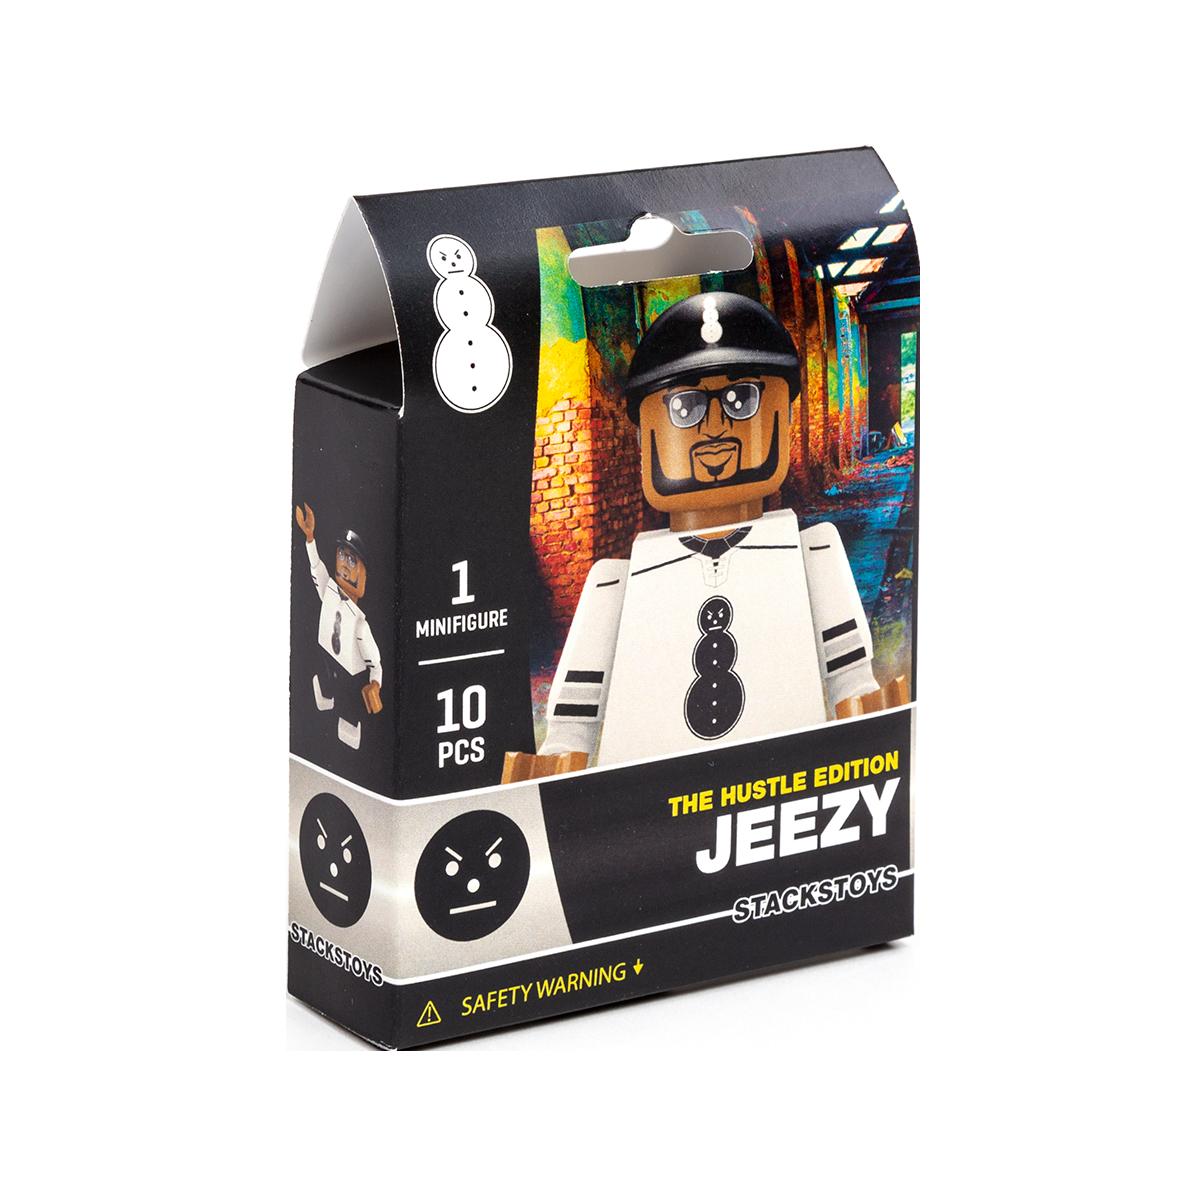 Jeezy The Hustle Edition Minifigure